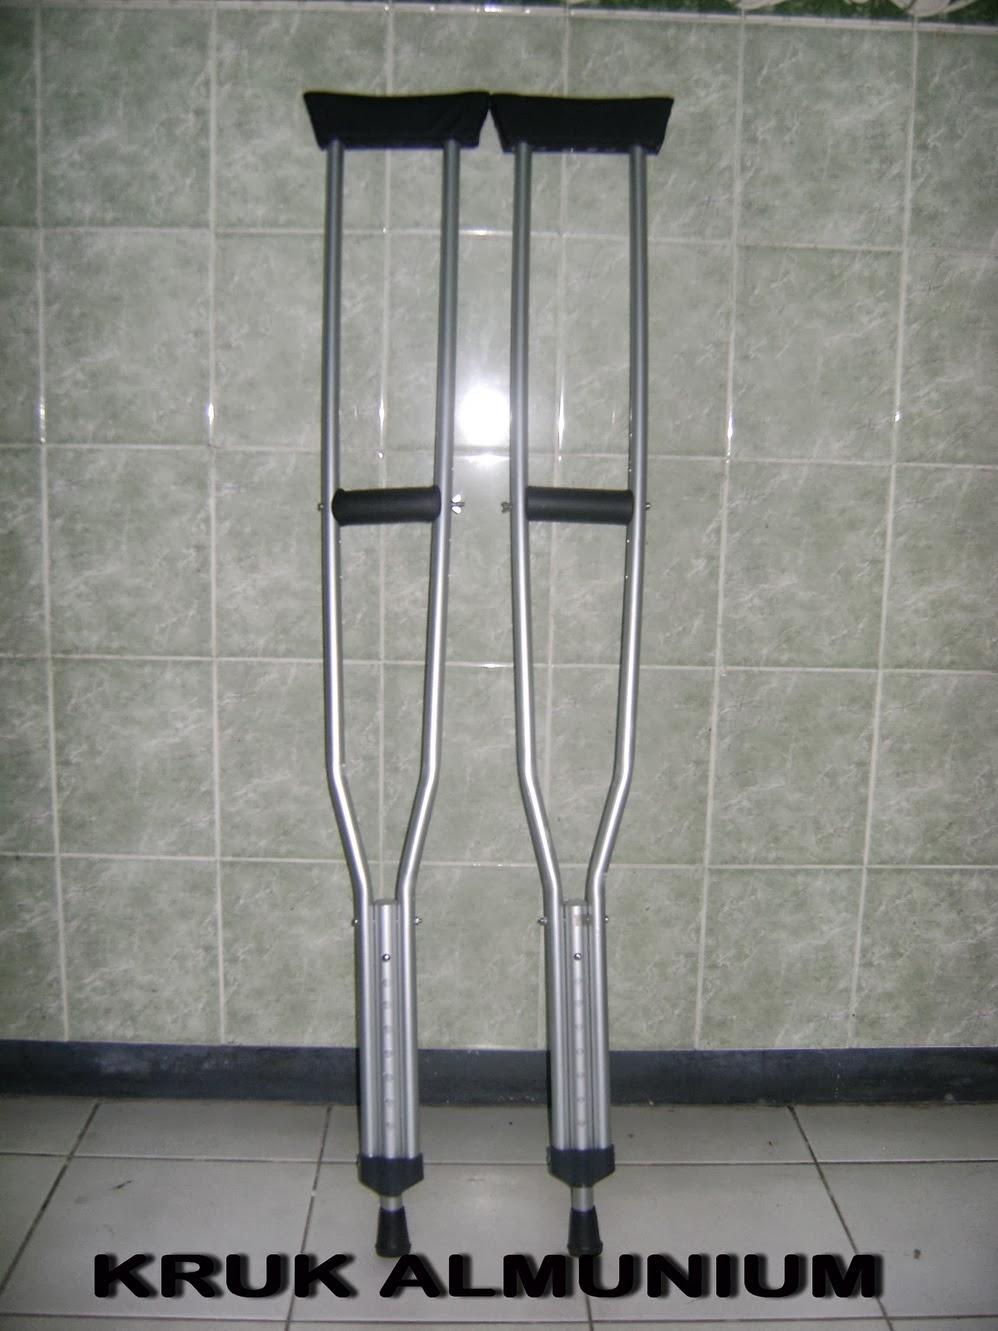 kruk alumunium